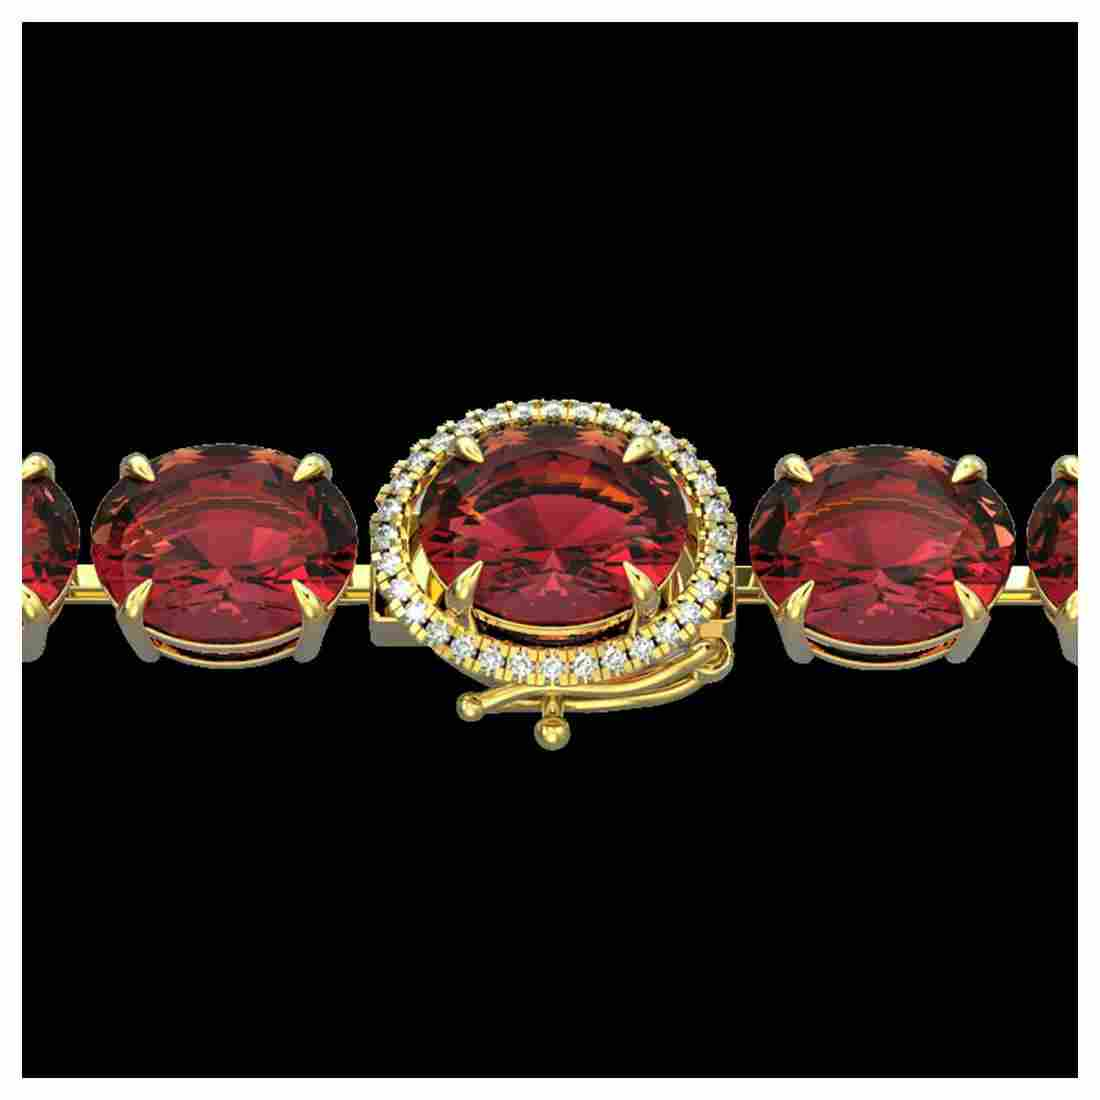 65 ctw Pink Tourmaline & Diamond Bracelet 14K Yellow